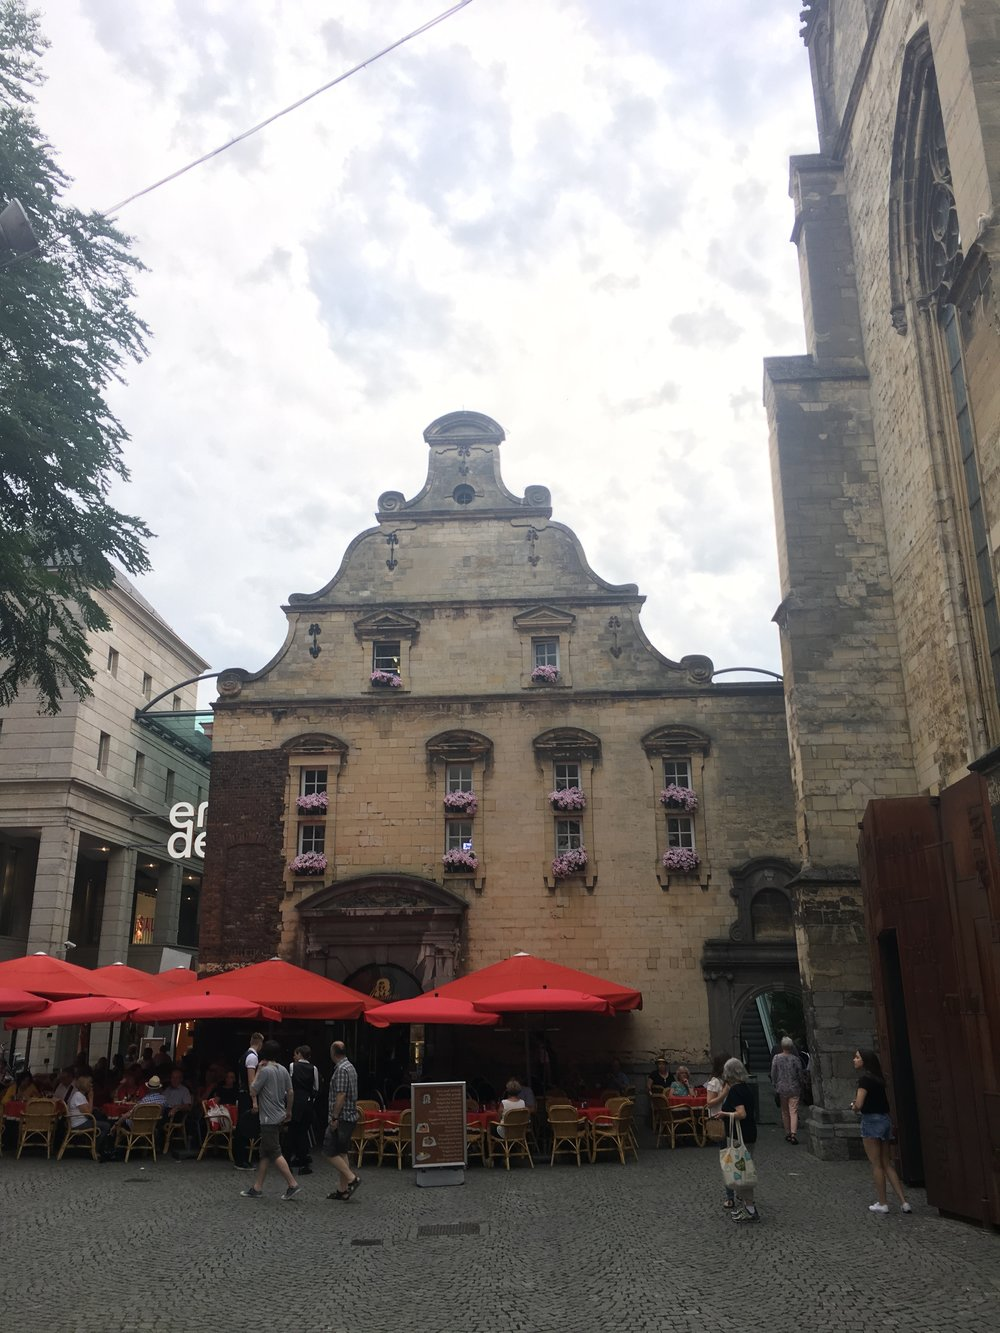 A square in front of Boekhandel Dominicanen Photo: S.Cooper